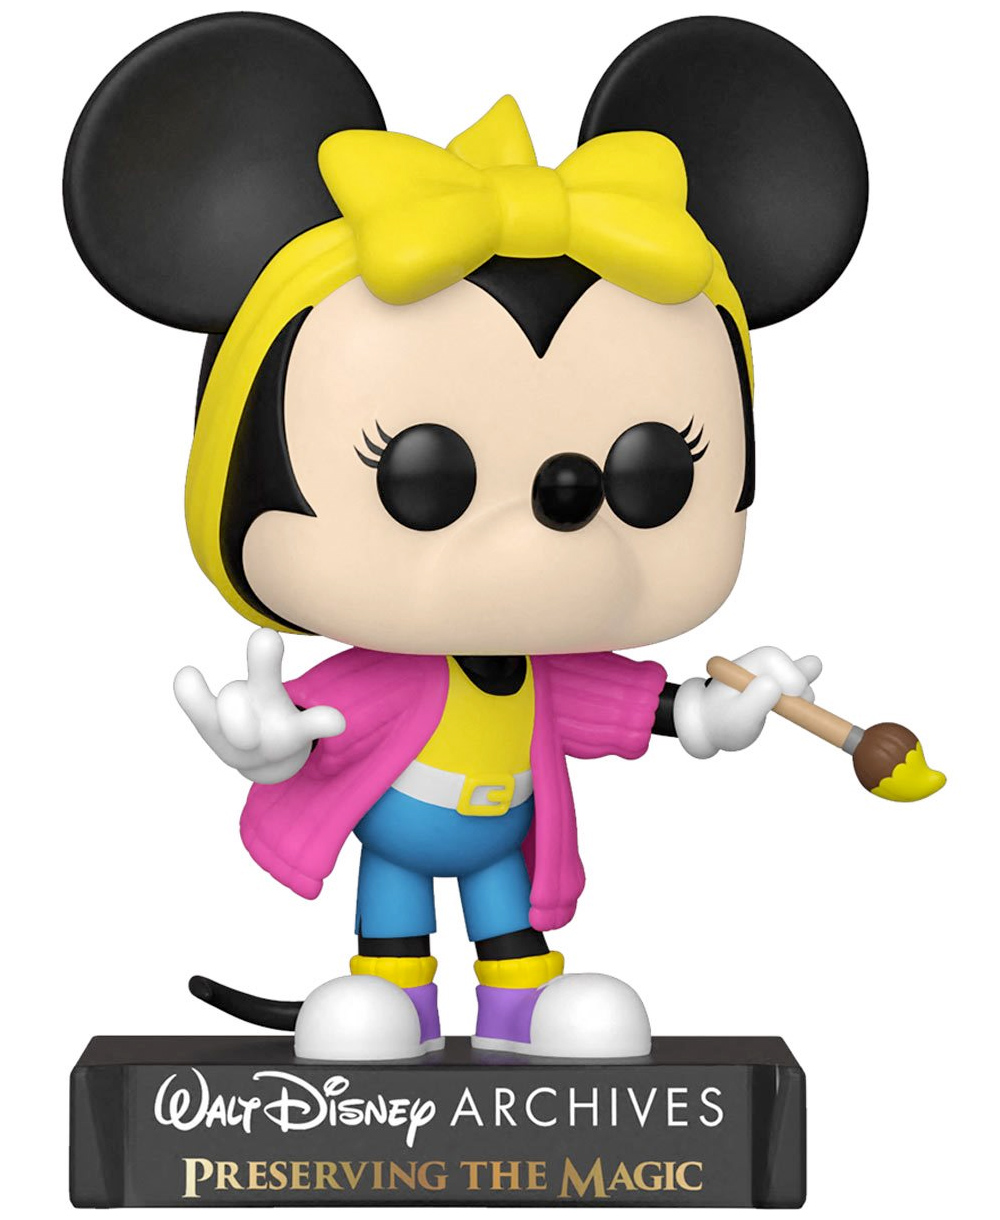 Bonecas Disney Archives Minnie Mouse Pop Collection